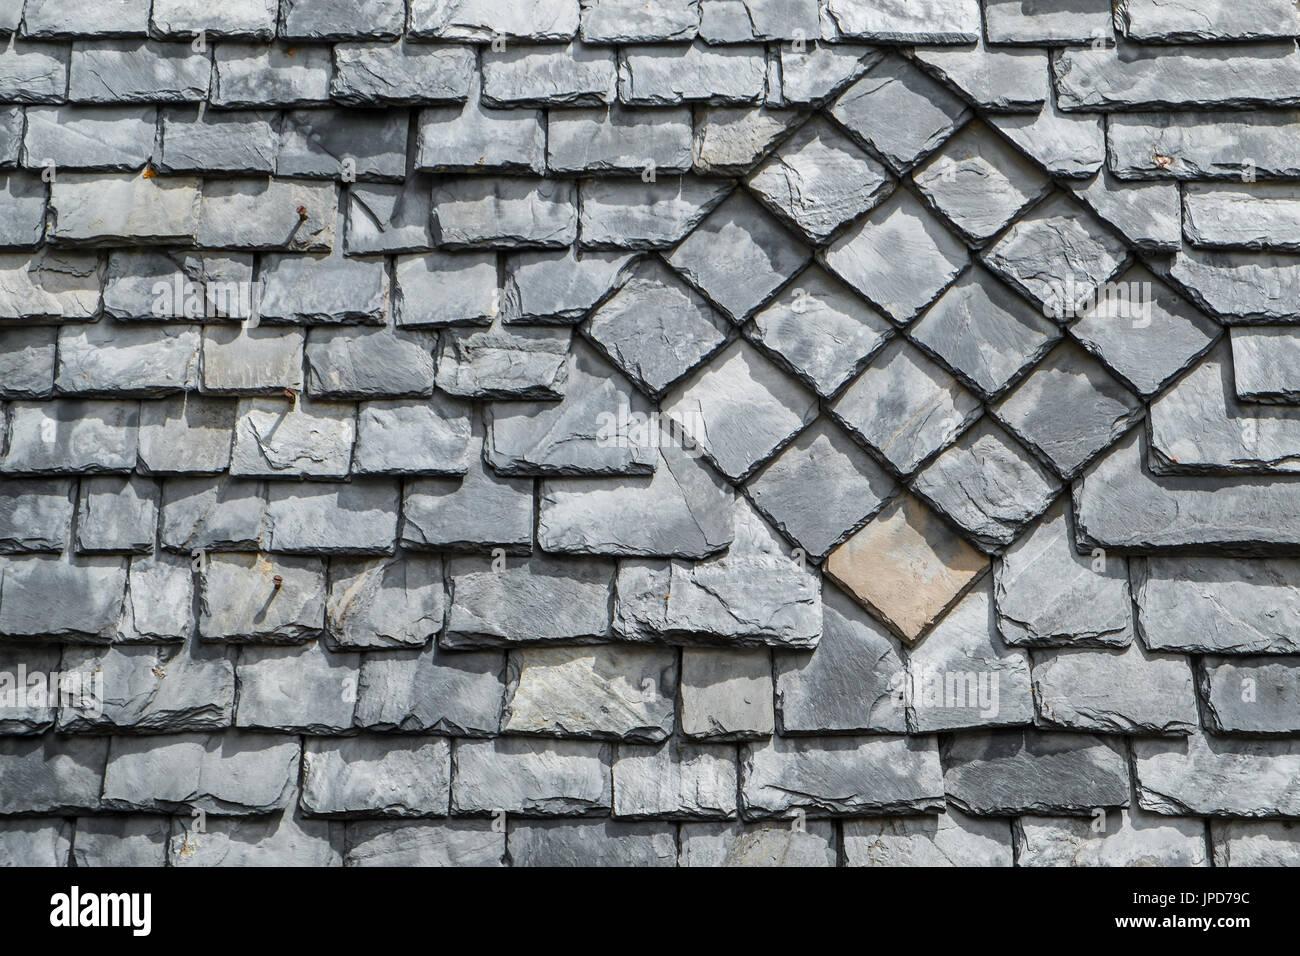 Decorative pattern on slated roof, Laruns, France. - Stock Image